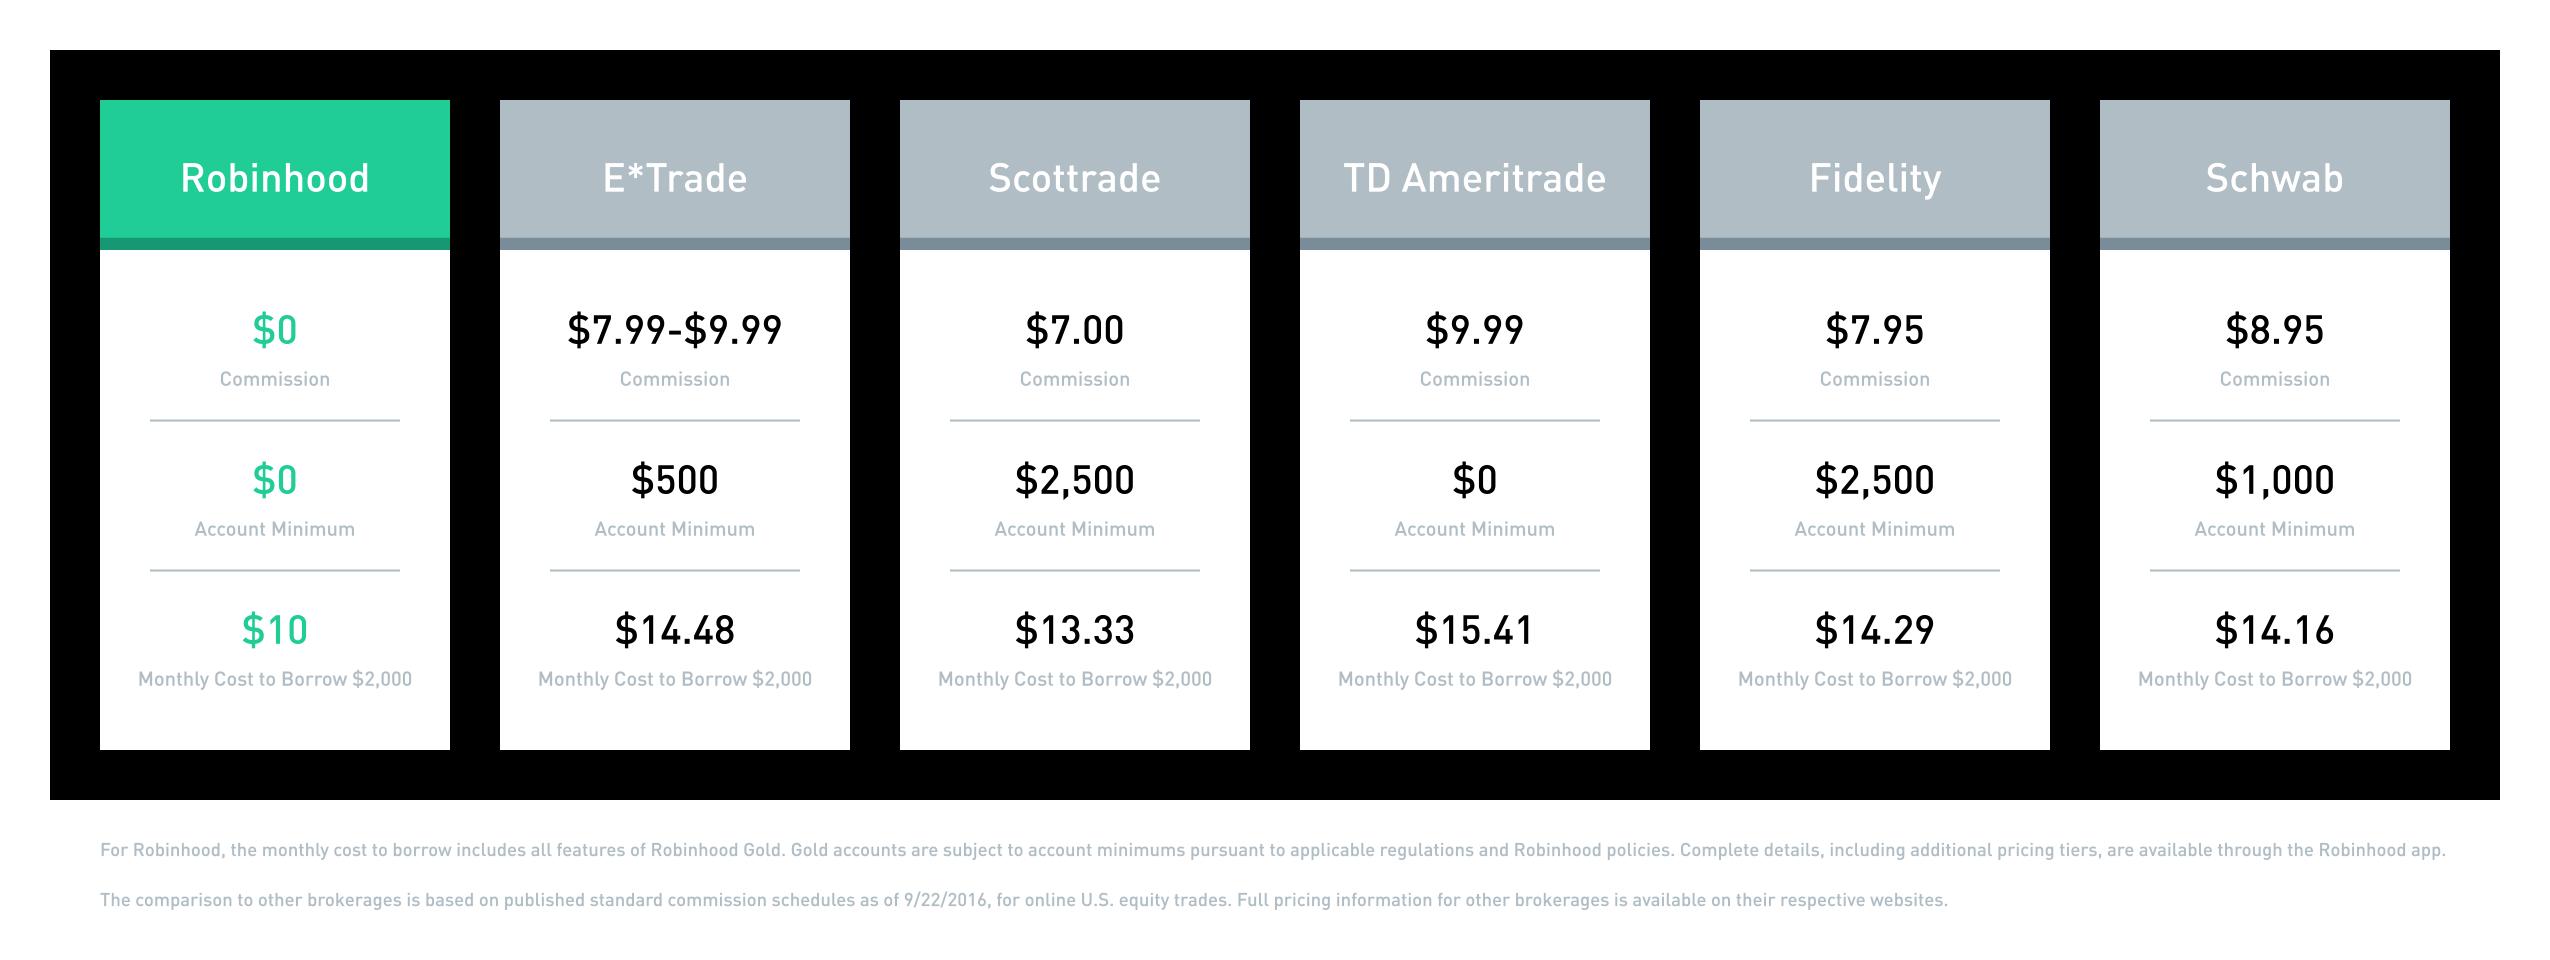 Robinhood price comparison chart